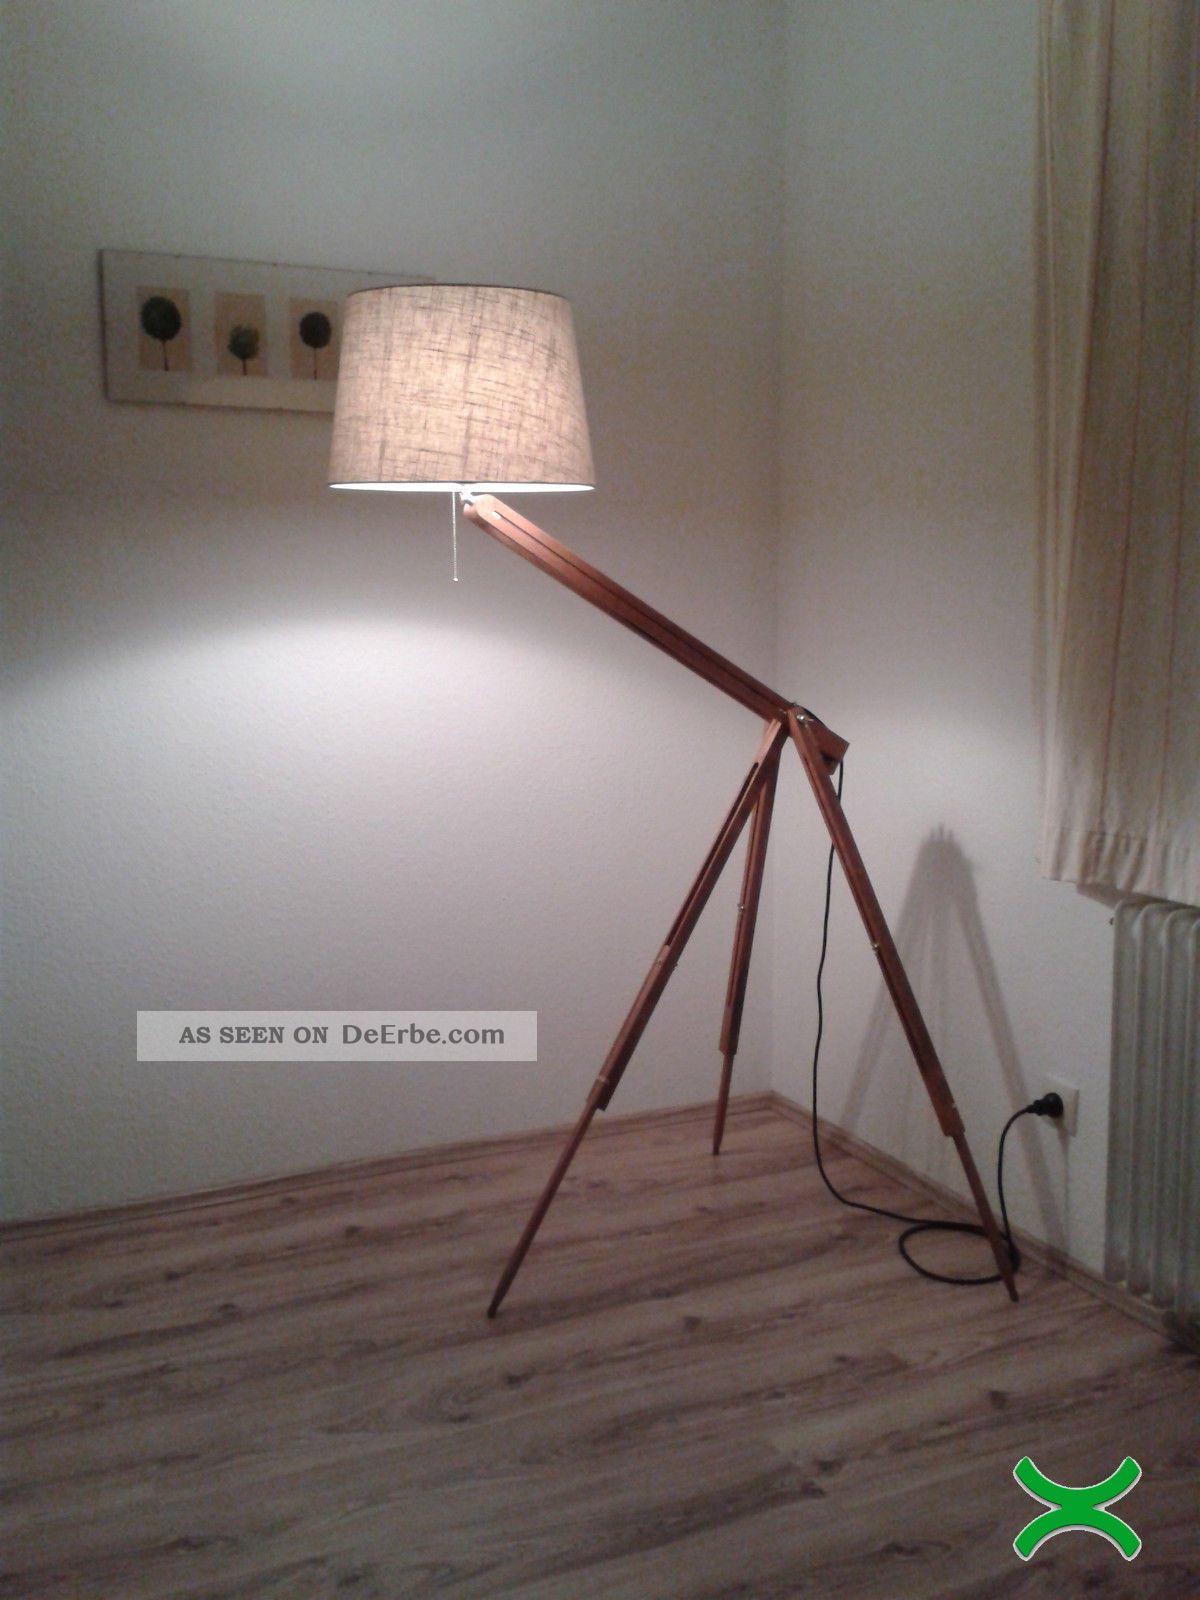 Lampe Stehlampe Bauhaus Tripod Lamp Kugel Architekt Shabby Chic Holz